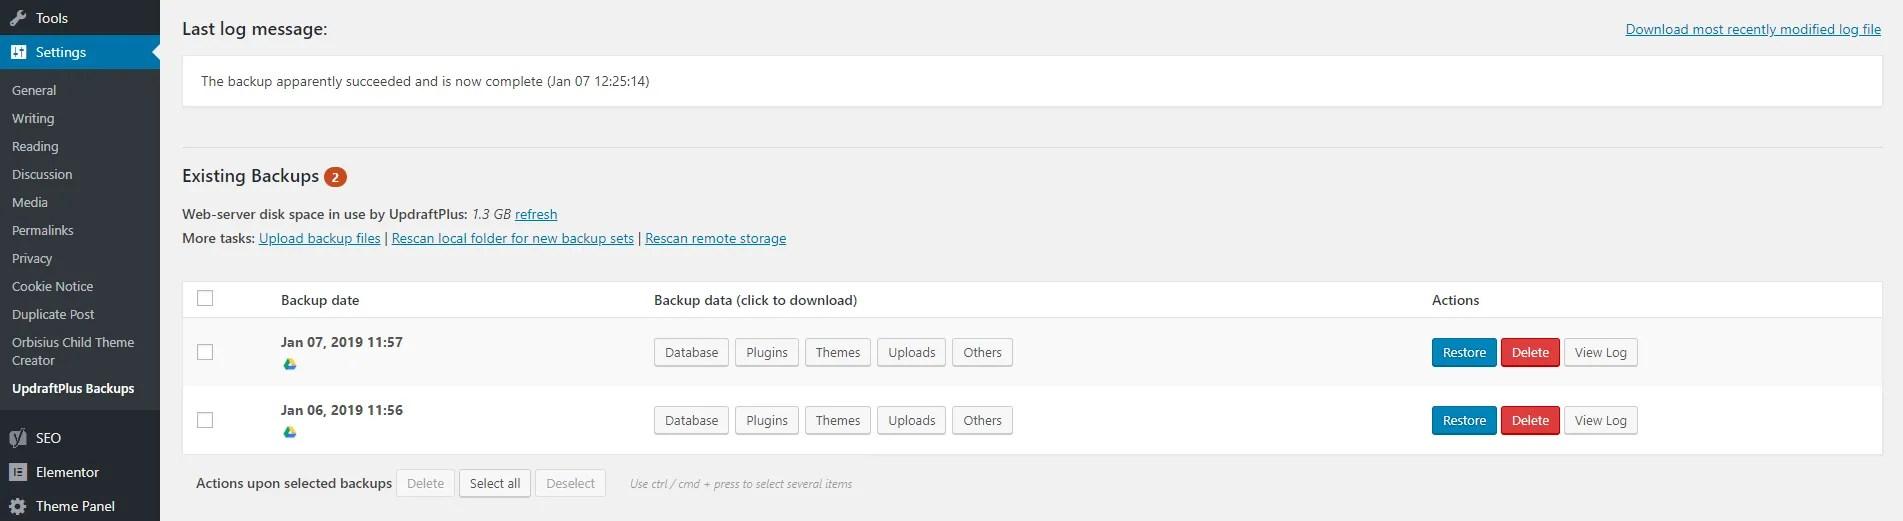 Finding UpdraftPlus Plugin in WordPress dashboard - How to Backup a WordPress Blog & Website - MintSwift